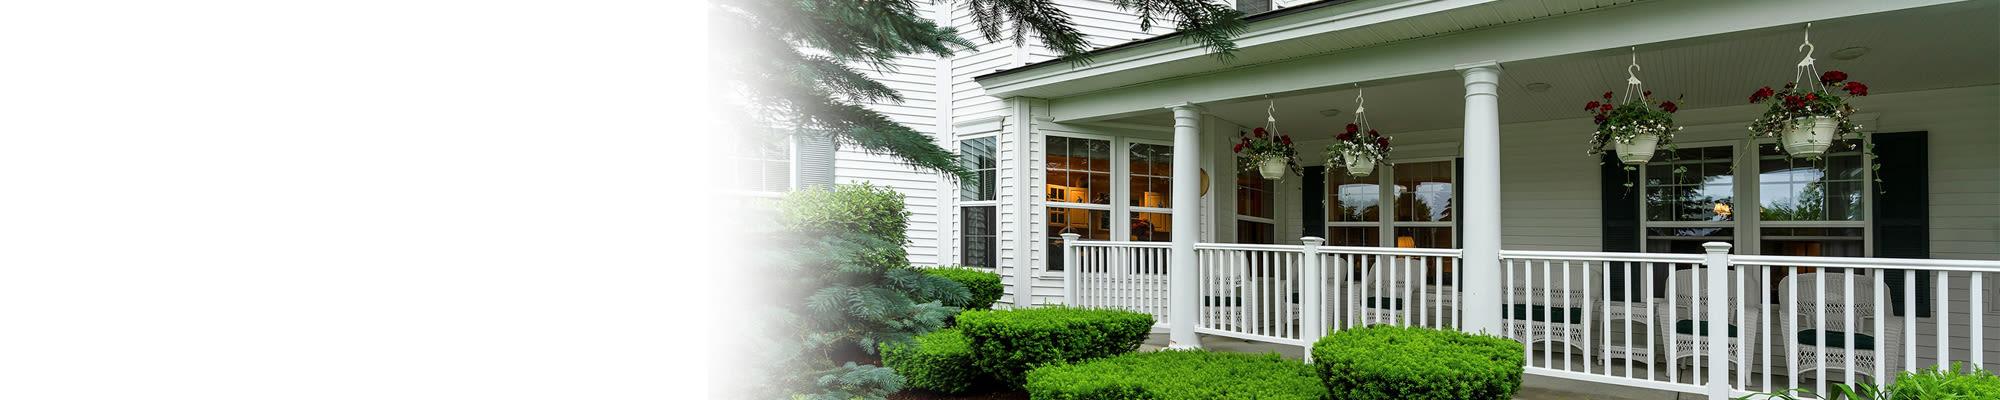 Testimonials for Valley Terrace in White River Junction, Vermont